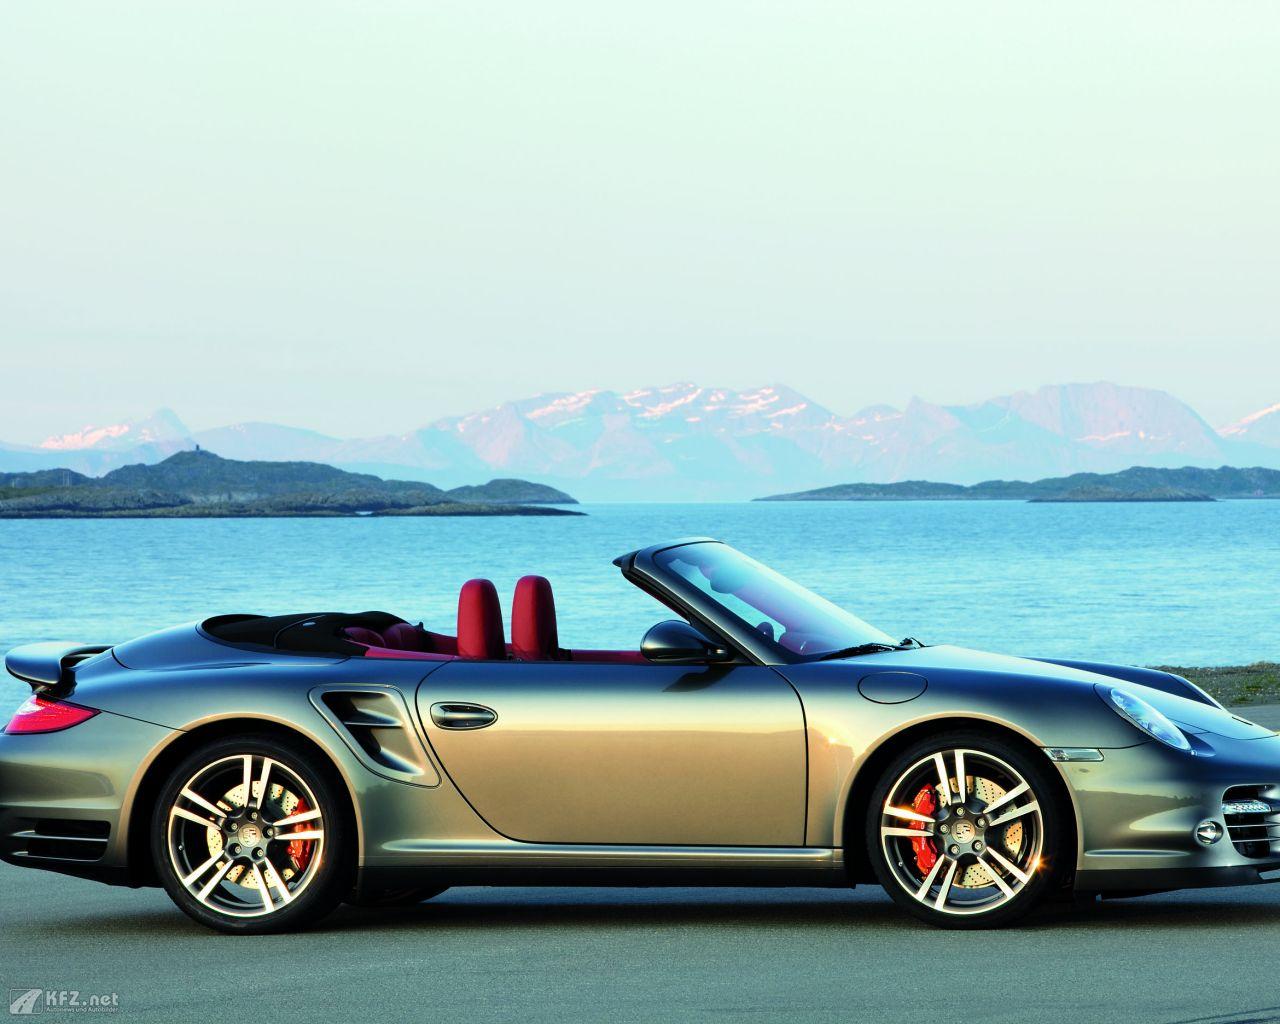 porsche-911-turbo-coupe-1280x1024-7